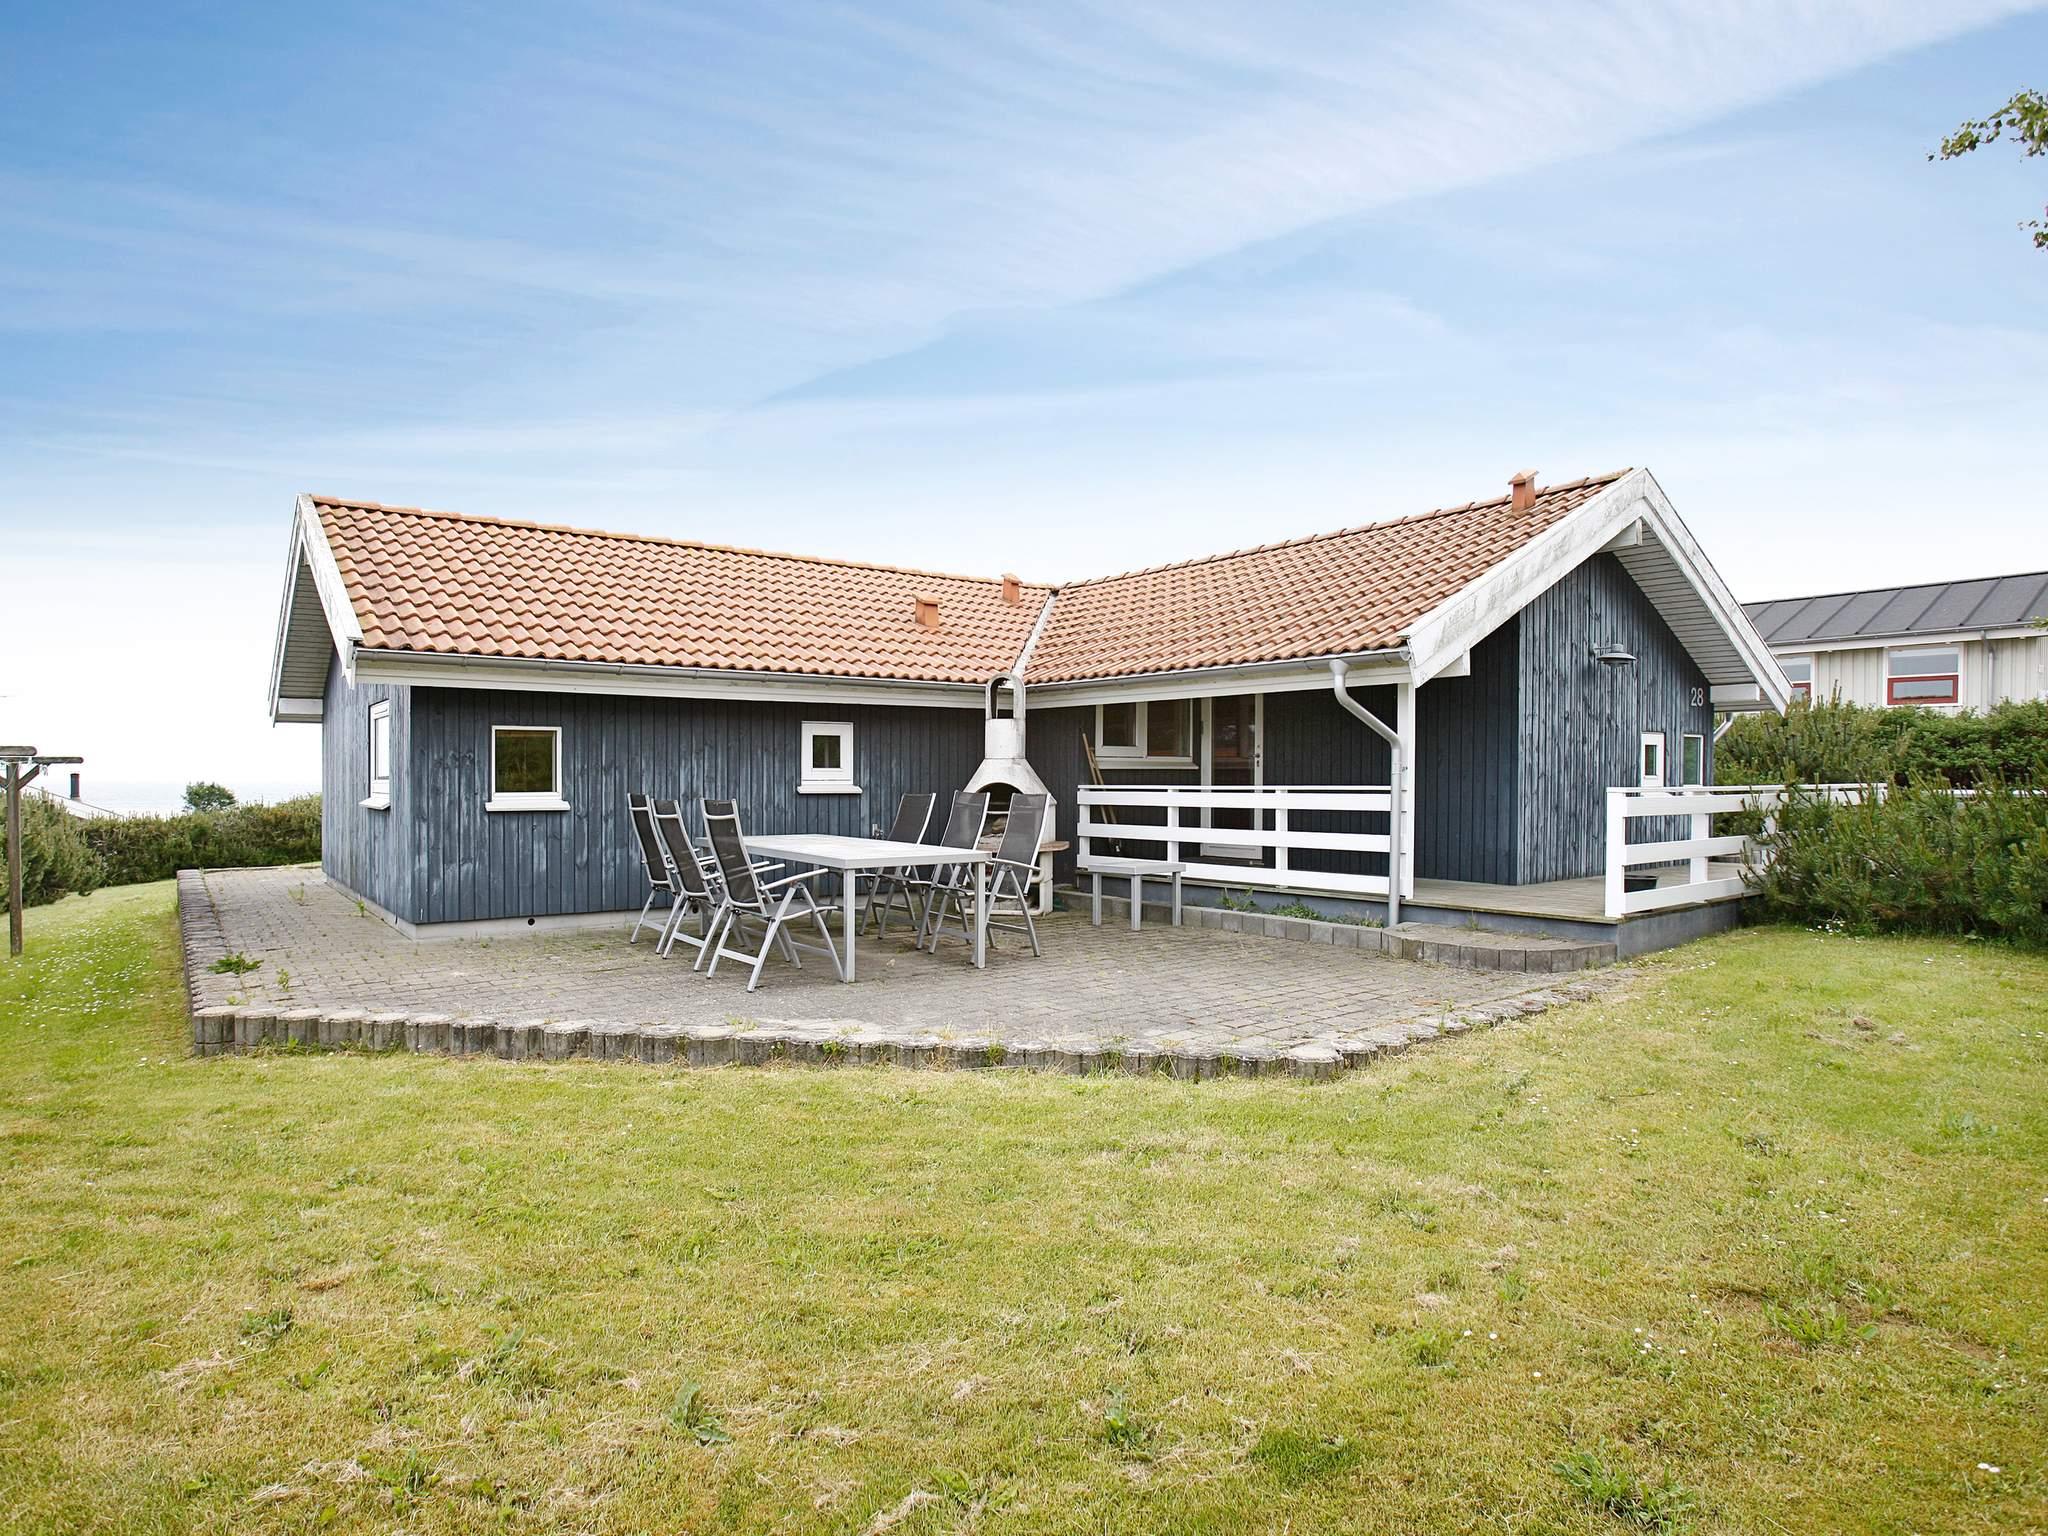 Ferienhaus Øster Hurup (814466), Øster Hurup, , Dänische Ostsee, Dänemark, Bild 11